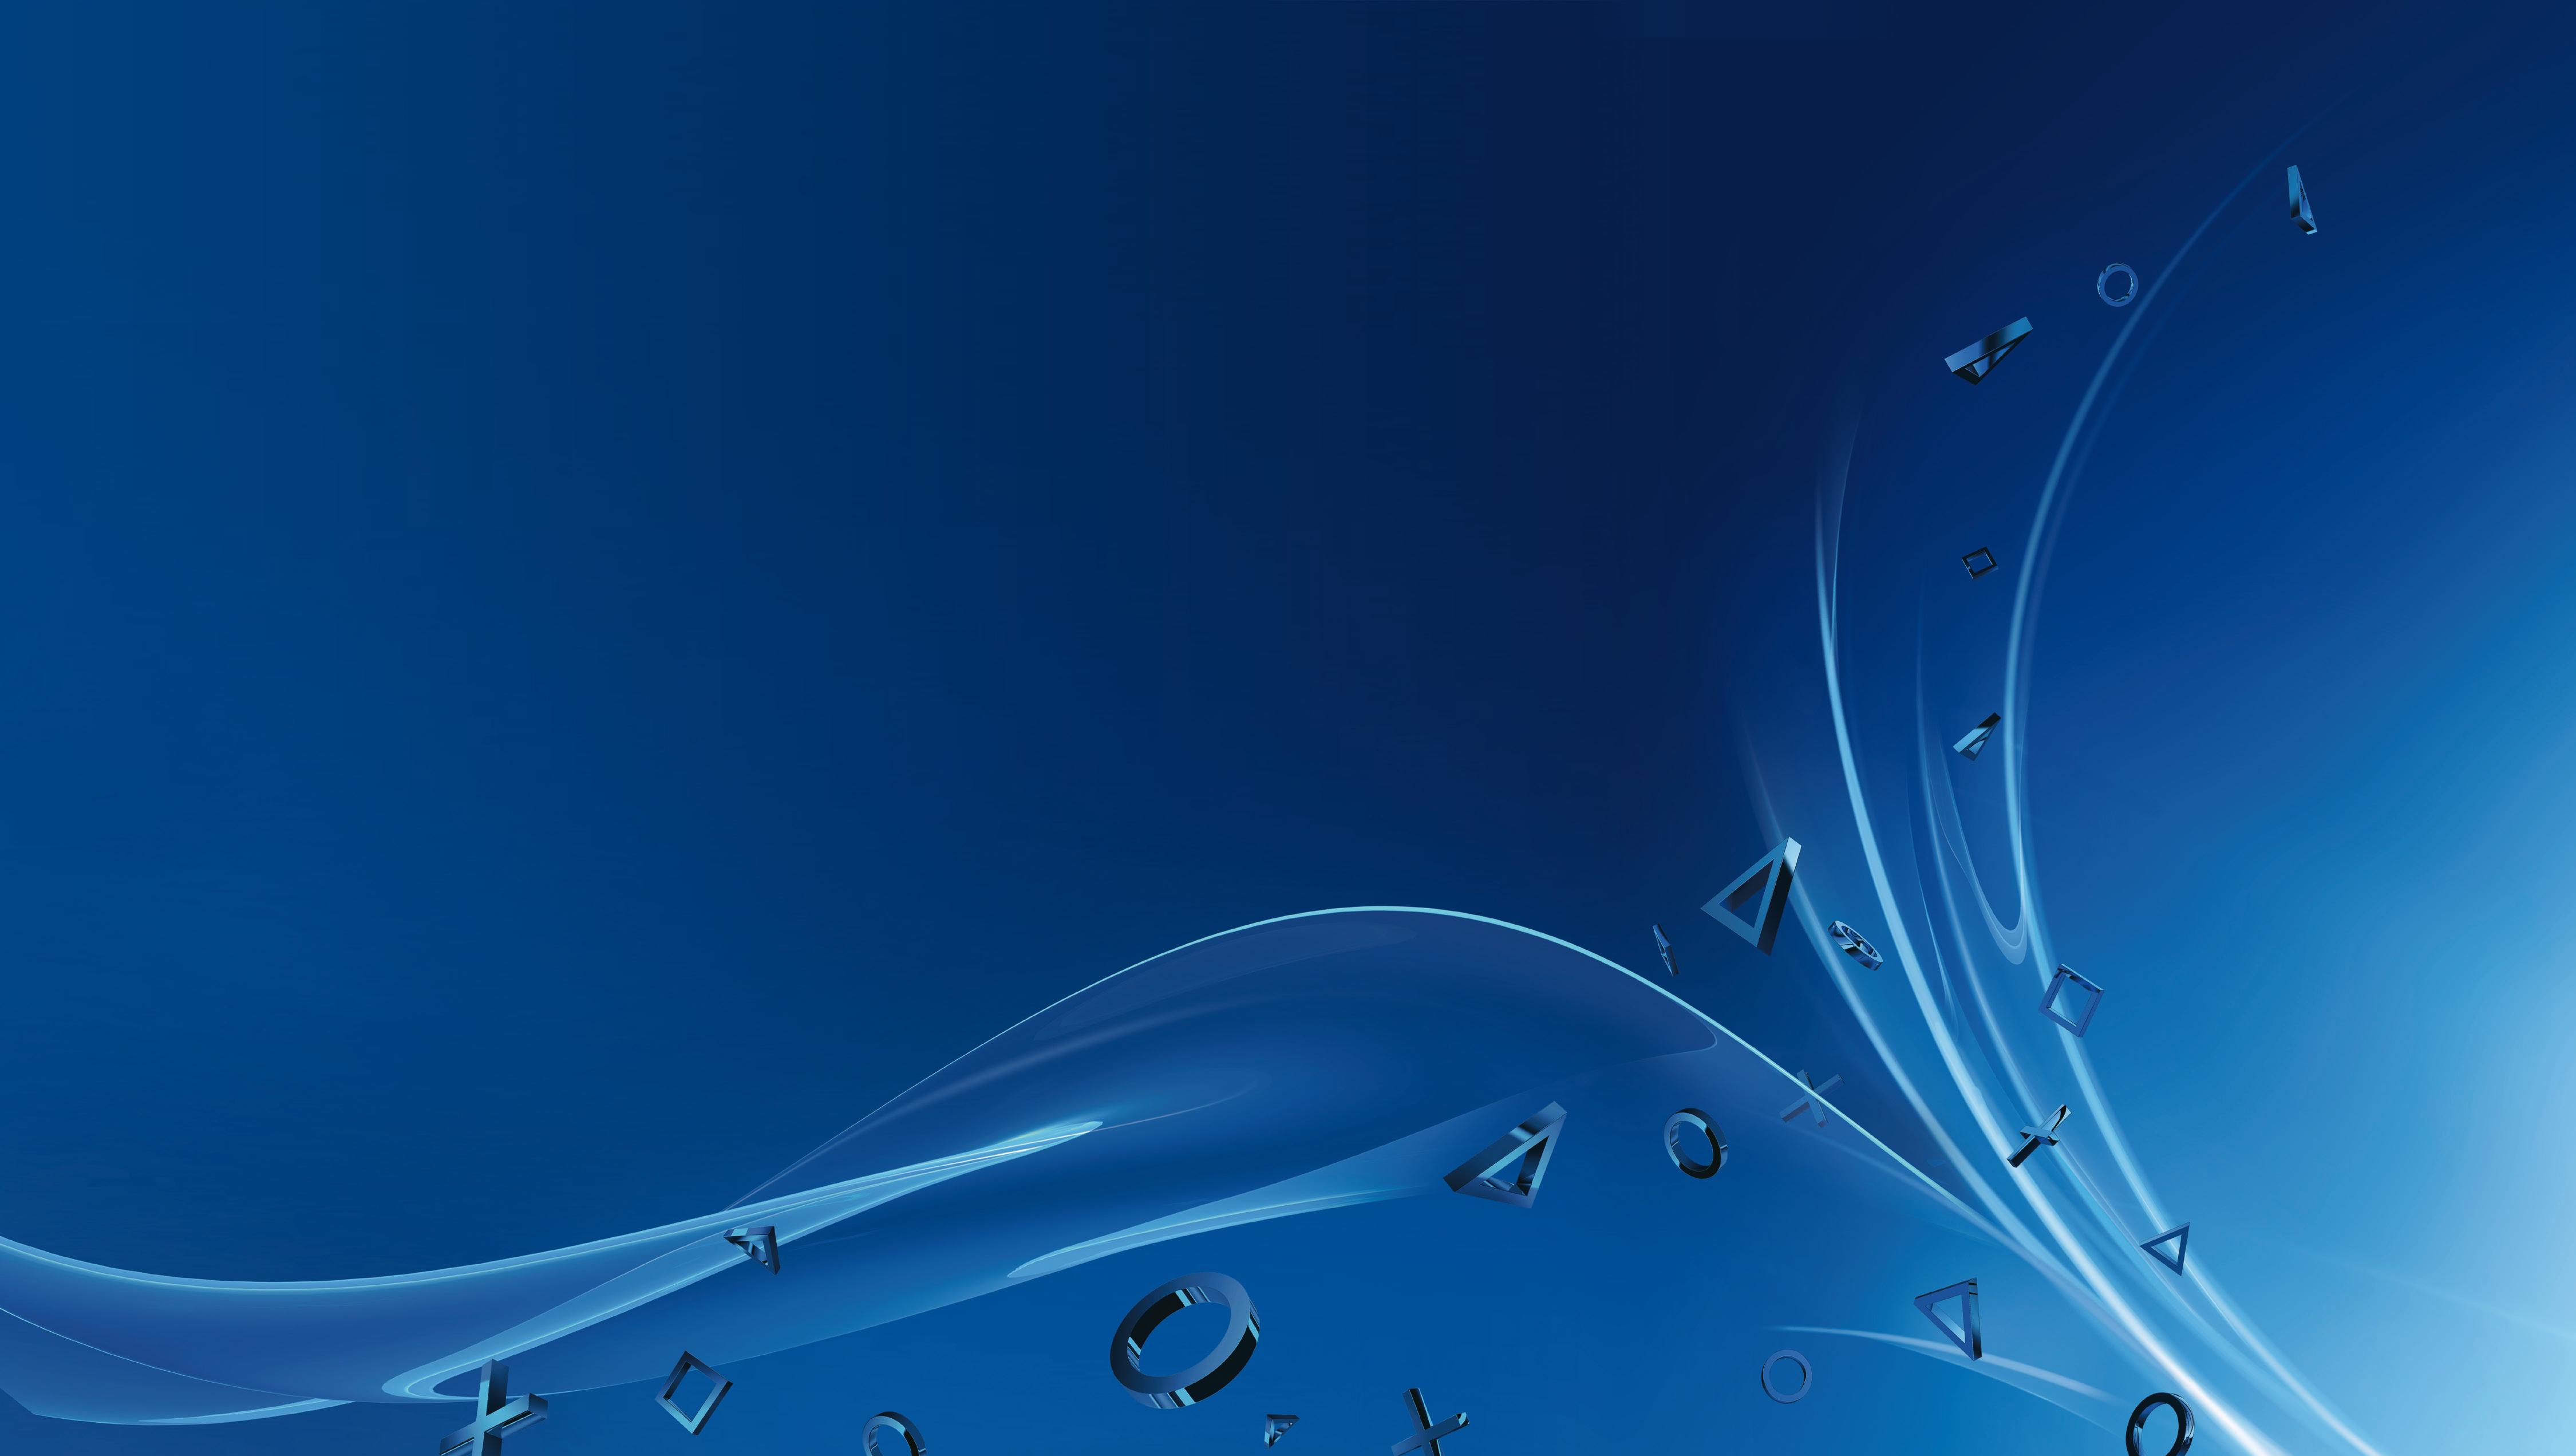 Retail Box Blue Wallpaper [4500x2543] iimgurcom 4500x2543